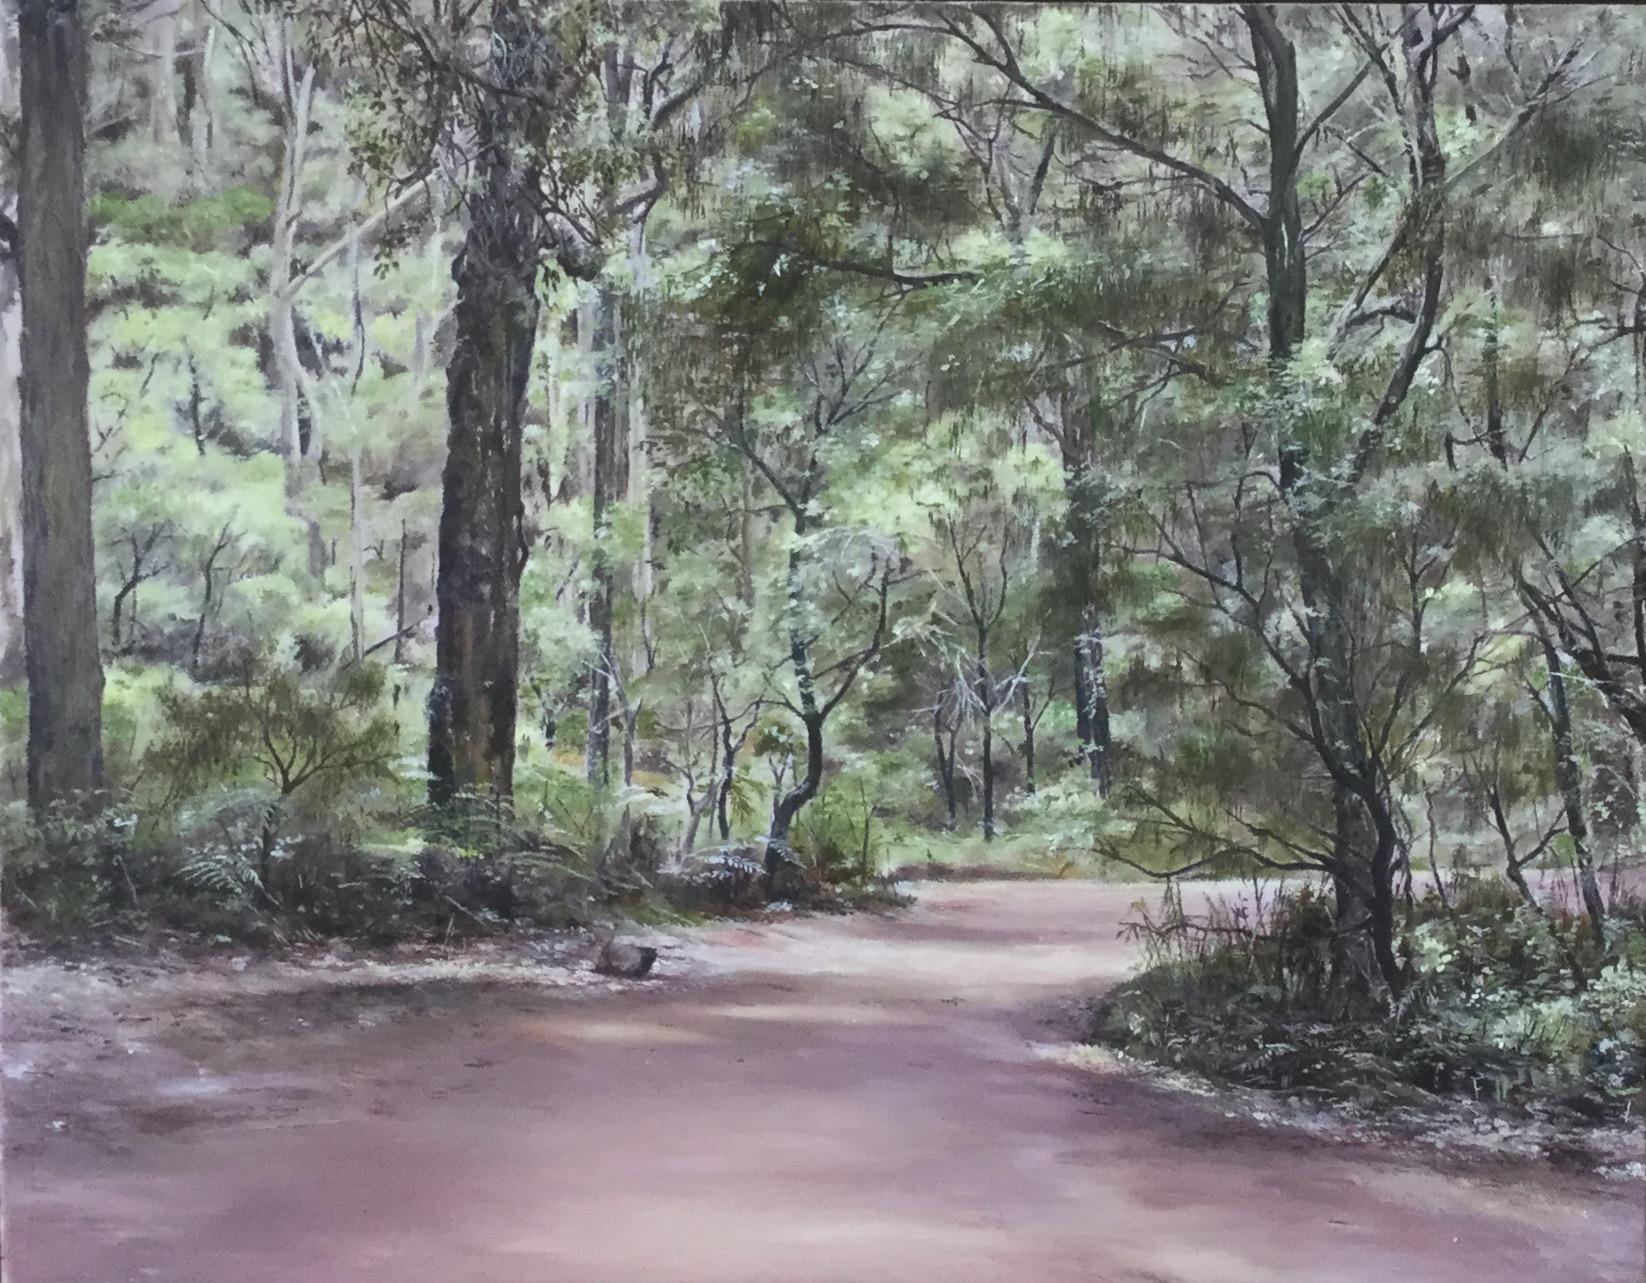 BORANUP FOREST